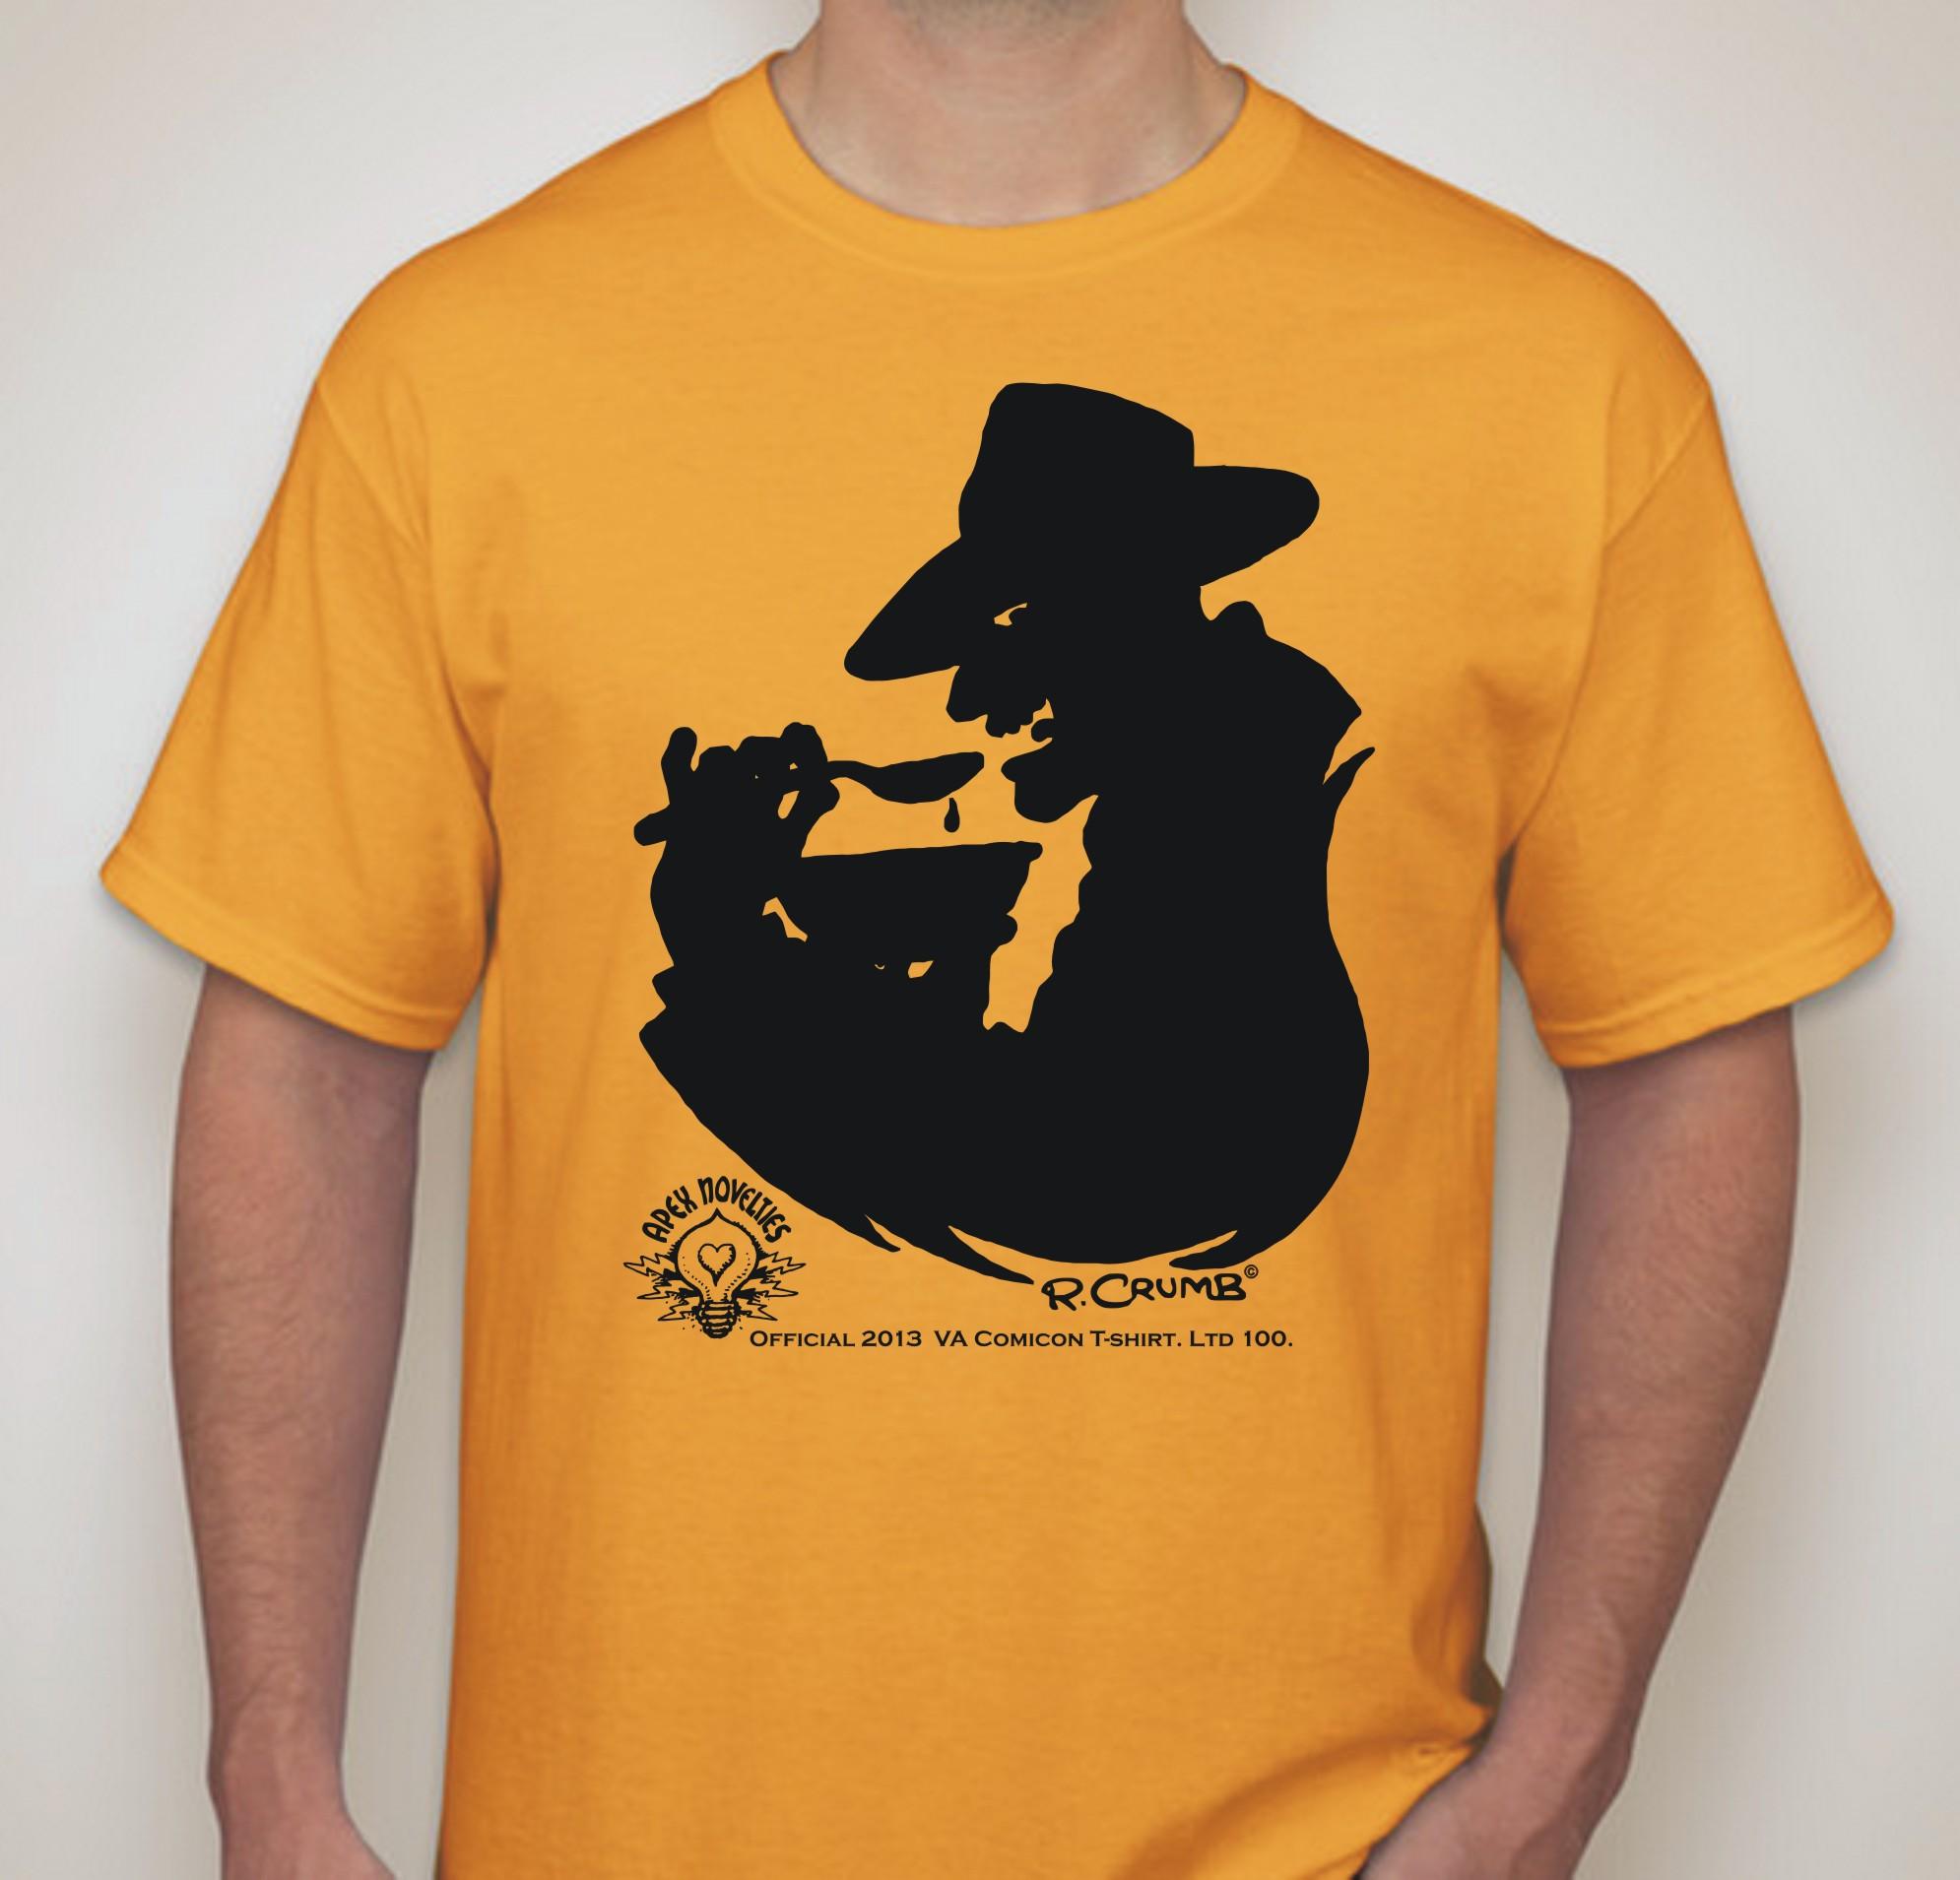 T shirt design richmond va - Robert Crumb T Shirt Ltd 100